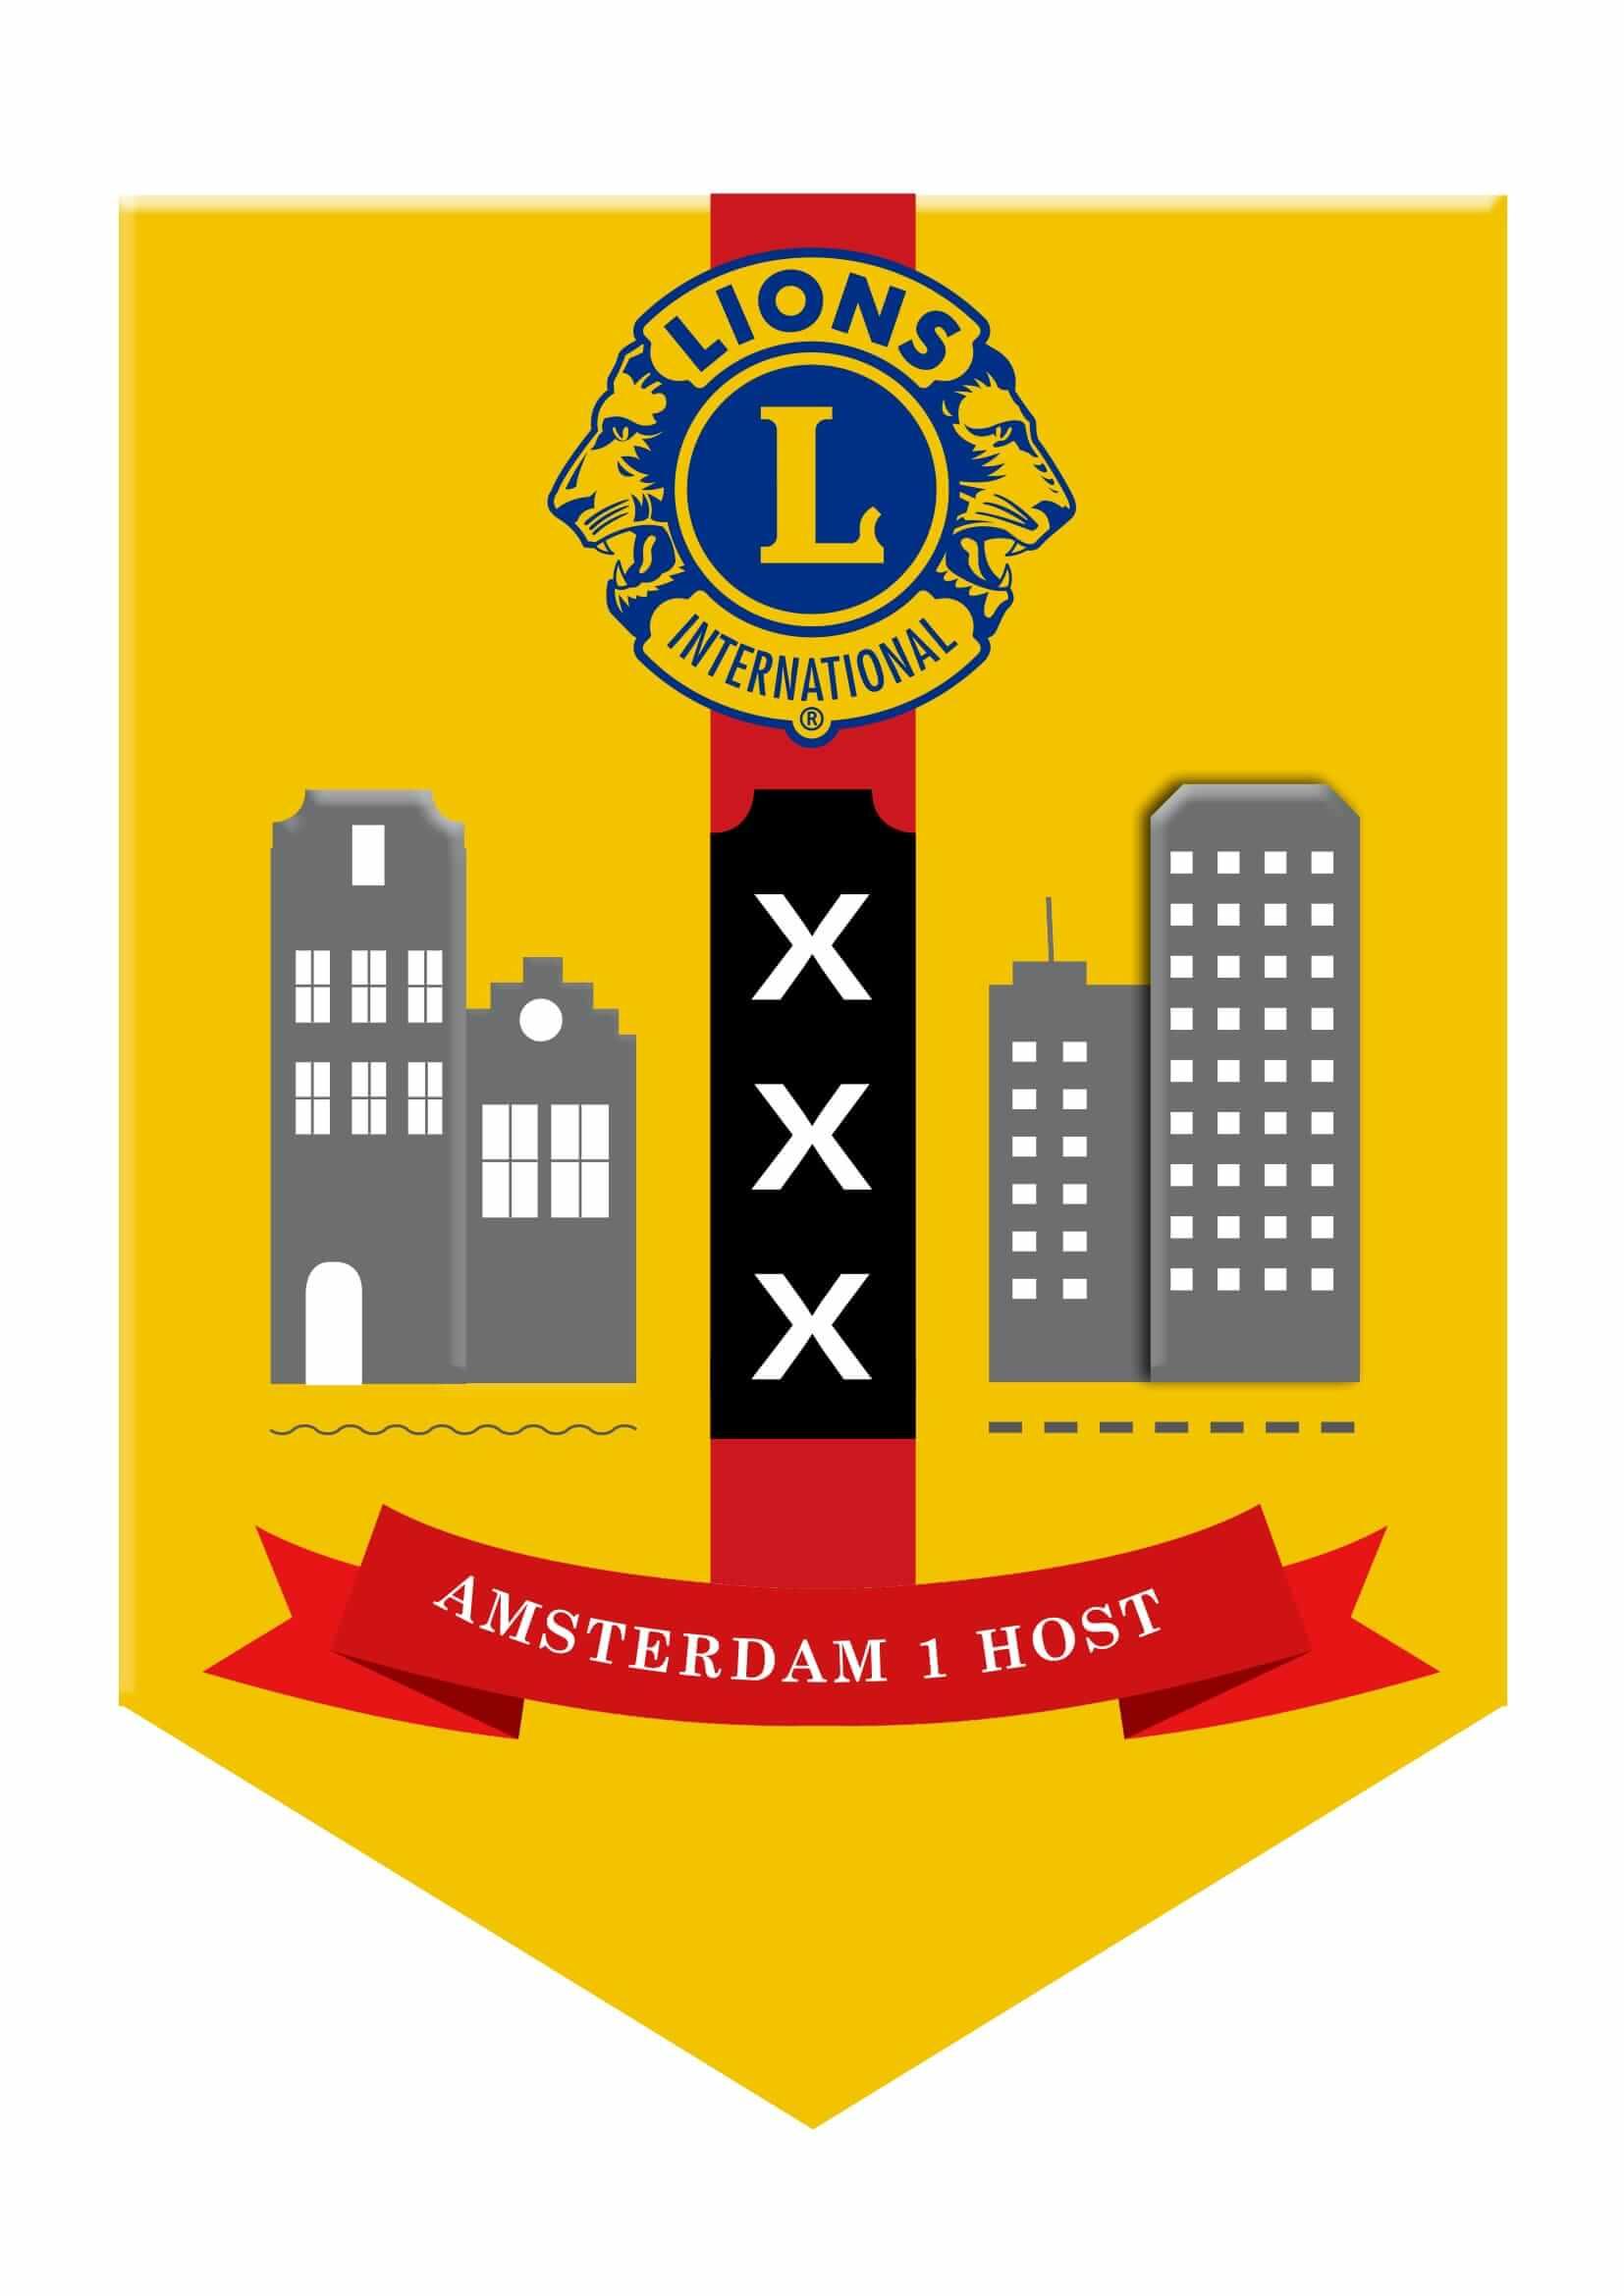 Lions Club Amsterdam 1 Host Zuidas